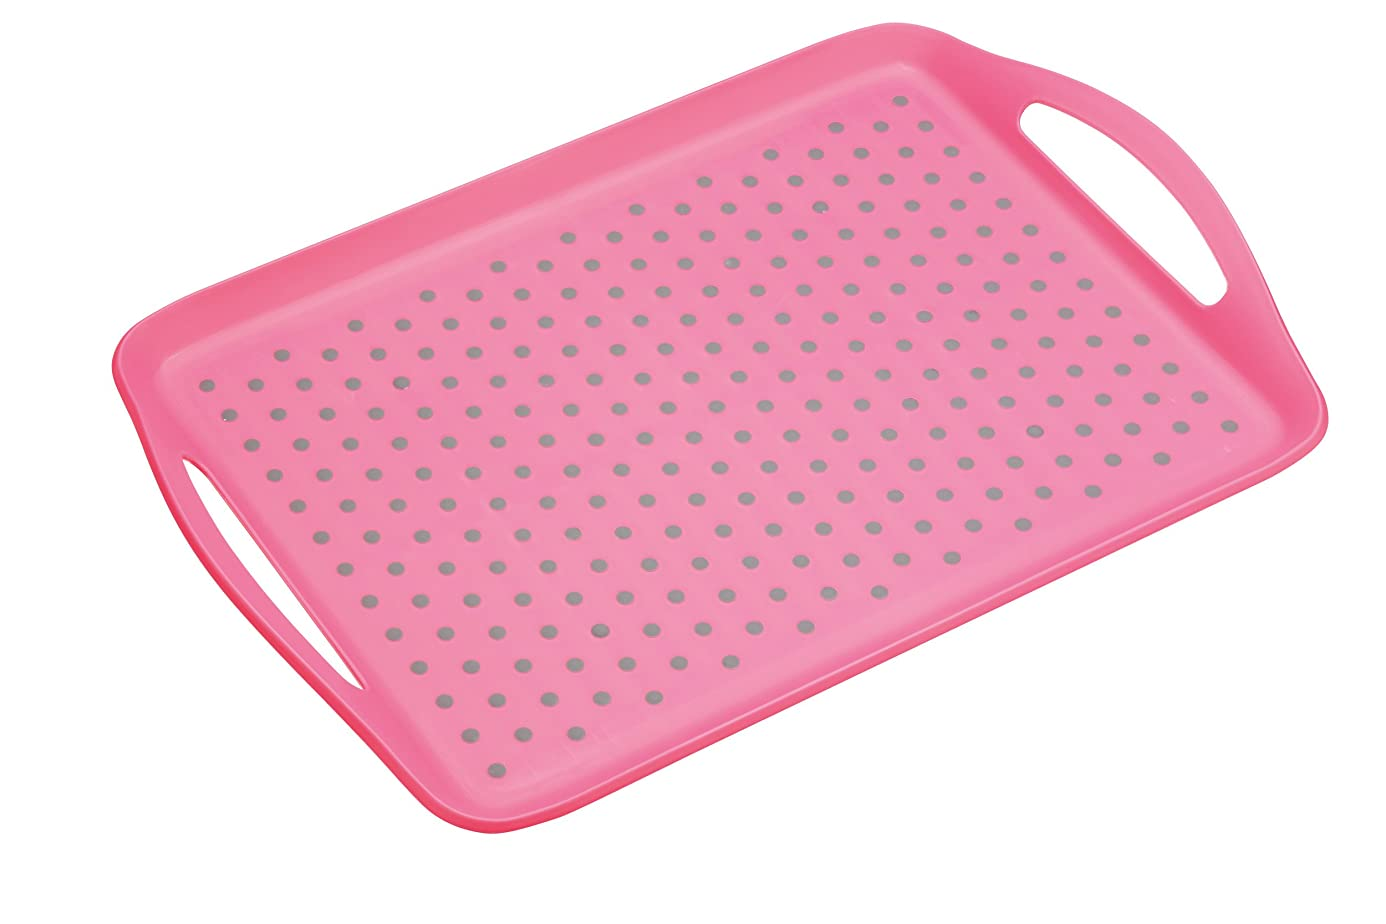 Kitchen Craft Colourworks Non-Slip Plastic Serving Tray, Pink, 28.5 x 41 cm nmb0187710